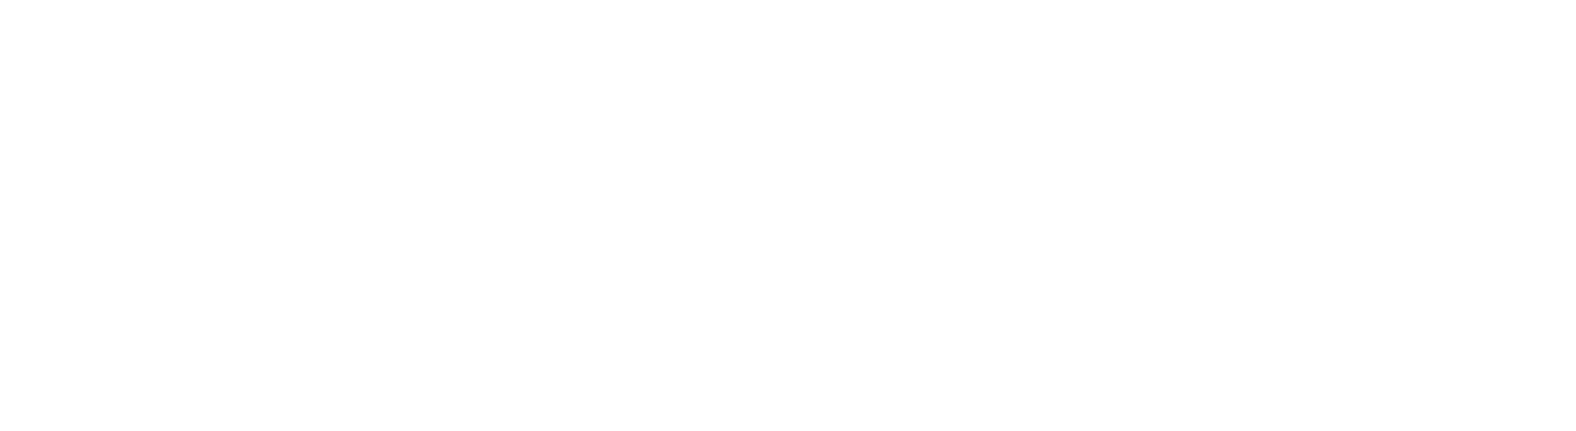 VERPAN logo white